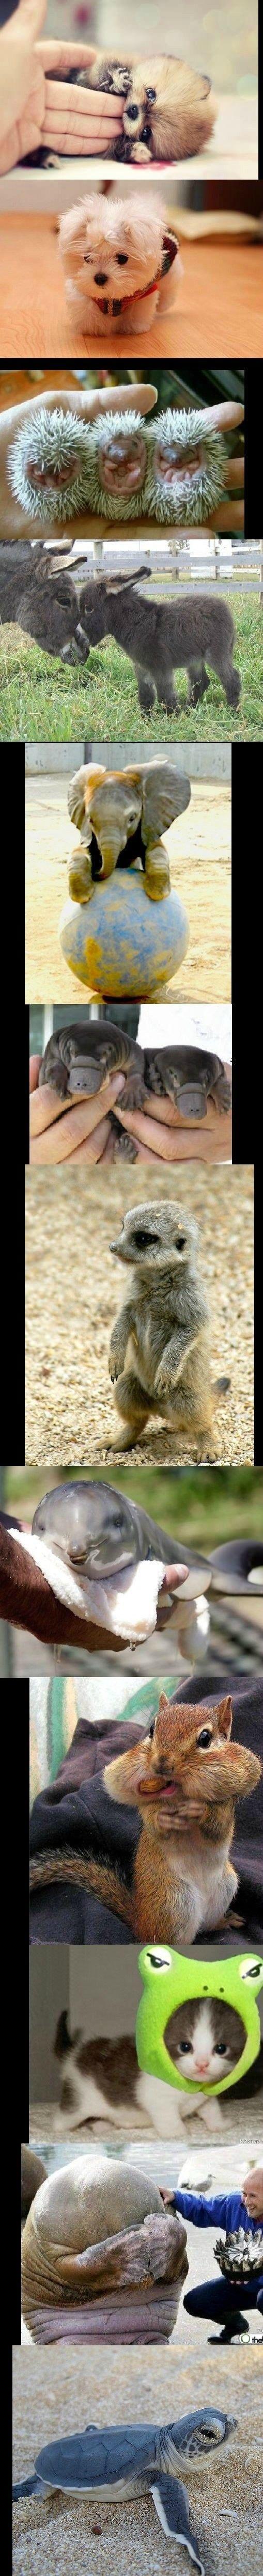 Animal babies <3.: